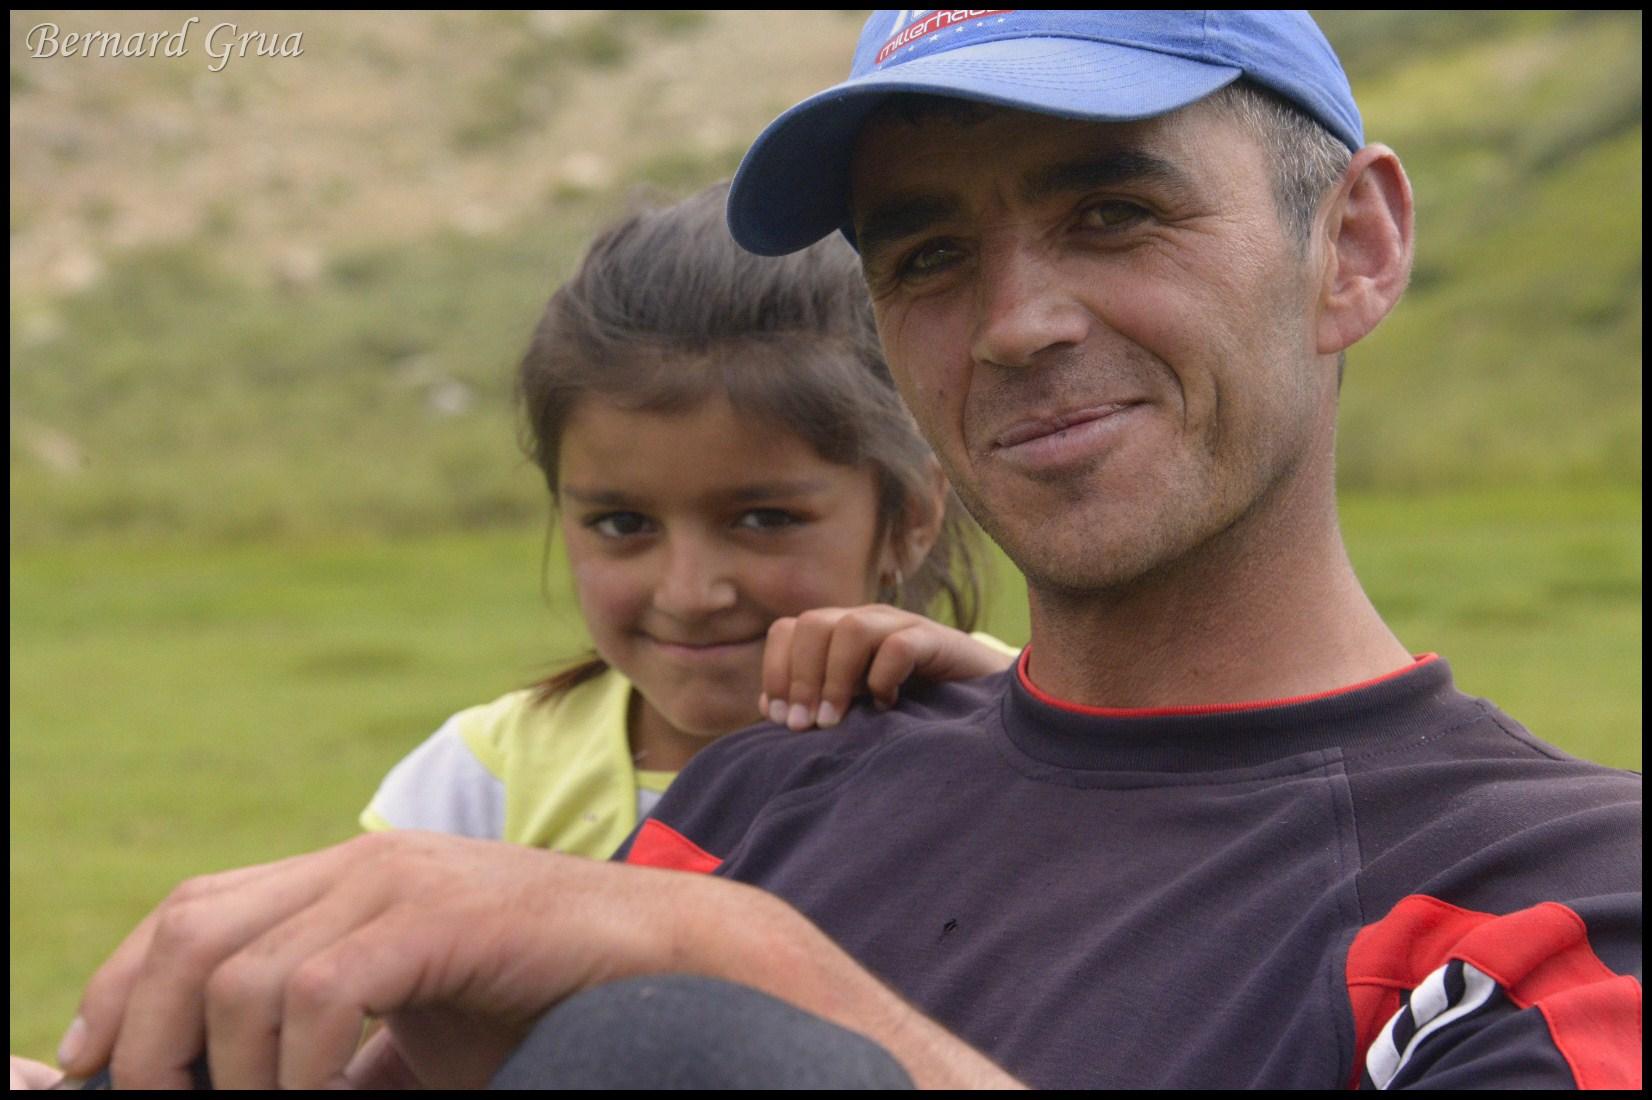 A proud father,, Pamir, Tajikistan - Tosion, Tusiyan, Tusen, Тусен